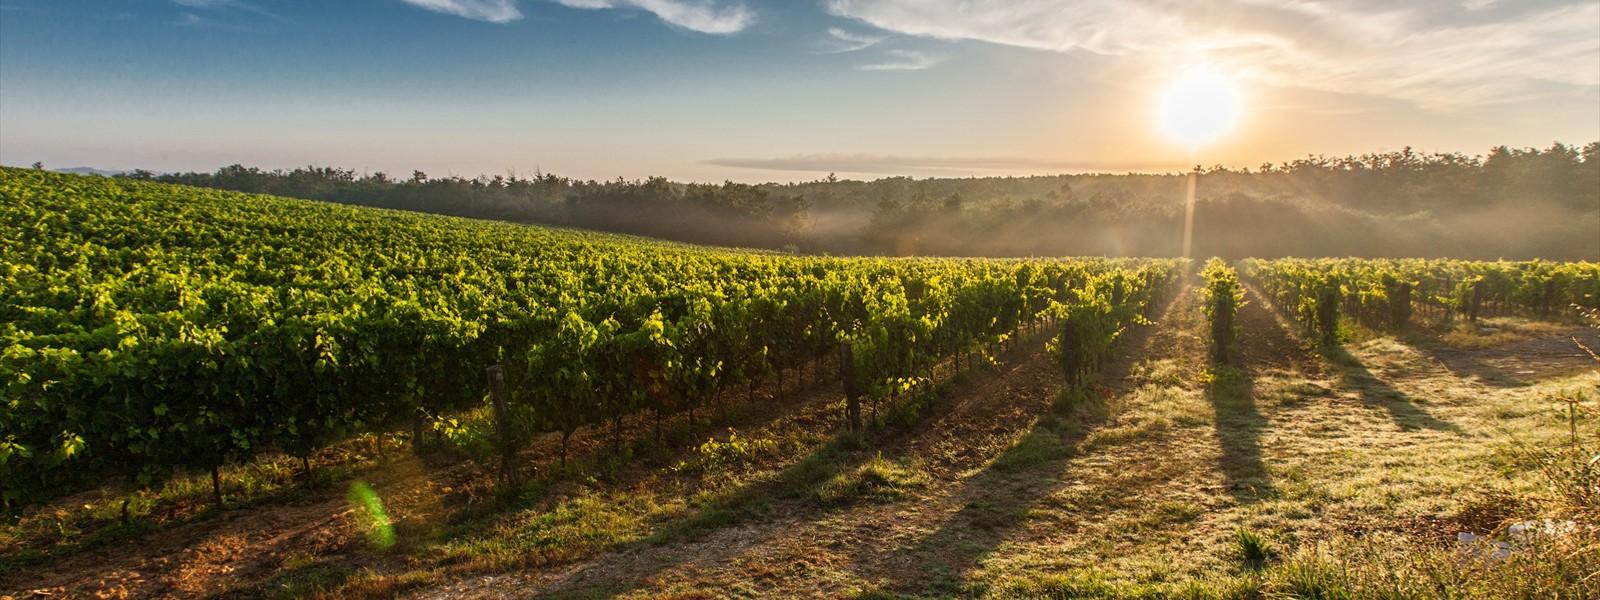 Grape field in Toscana :